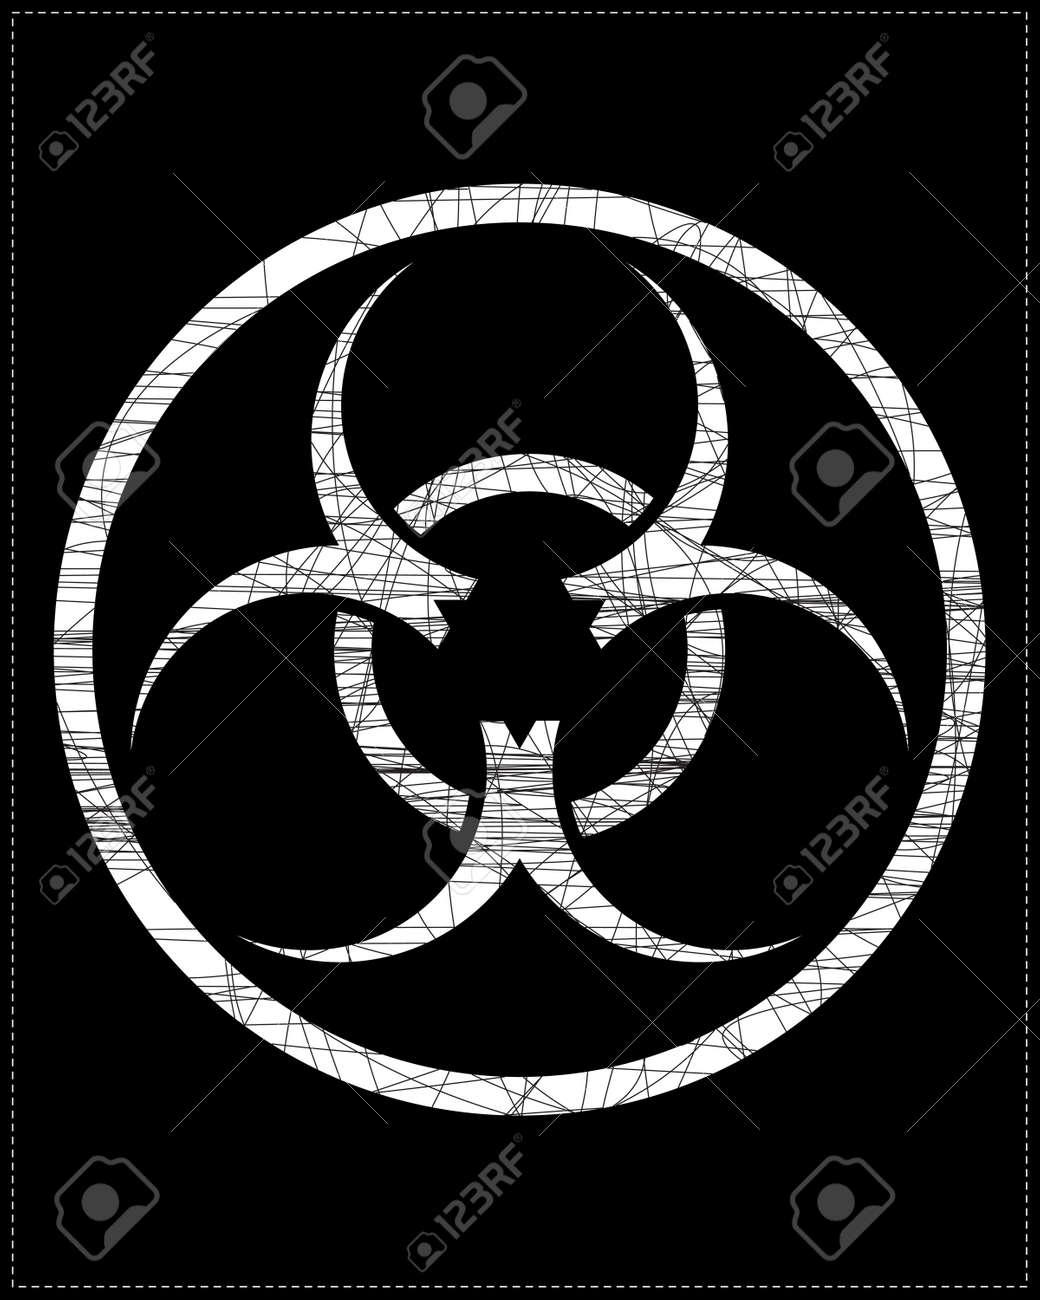 White biohazard symbol Stock Vector - 20183972